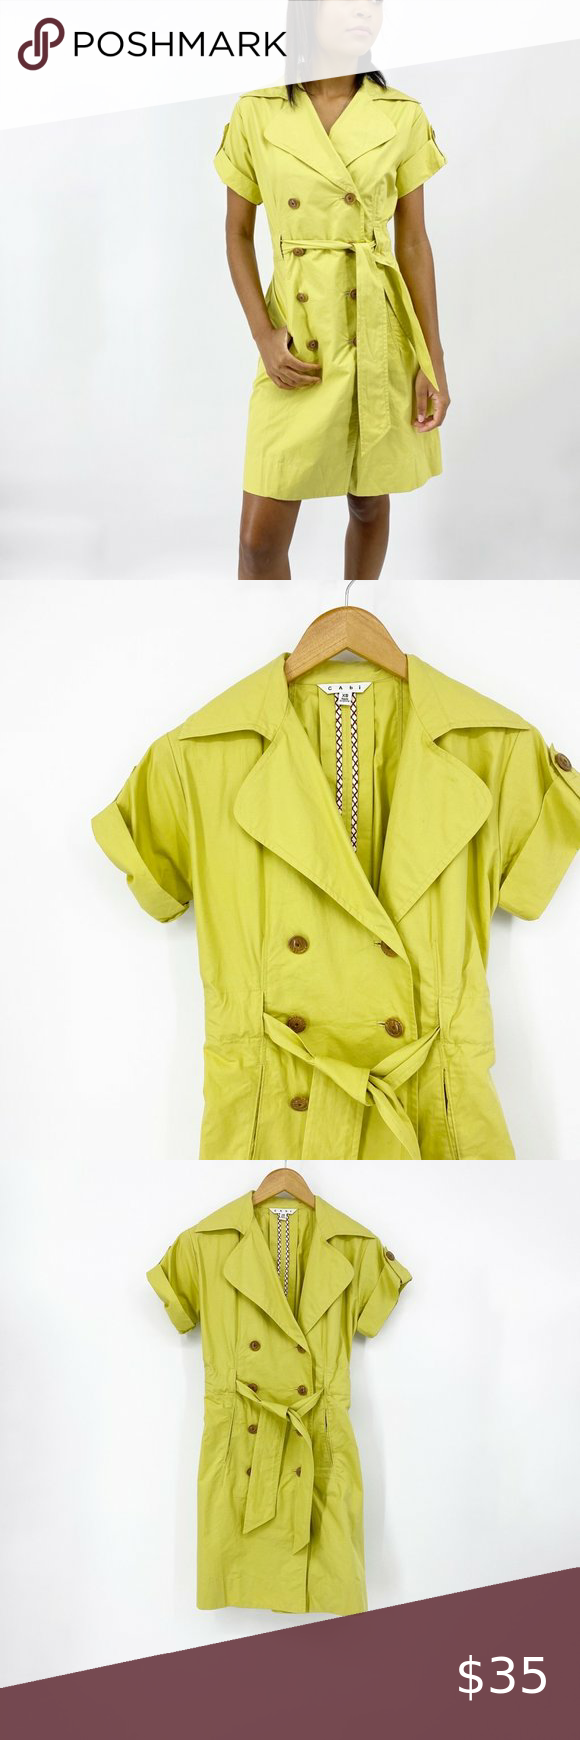 Cabi Safari Trench Coat Dress Loquat Green Size Xs Trench Coat Dress Coat Dress Trench Coat [ 1740 x 580 Pixel ]